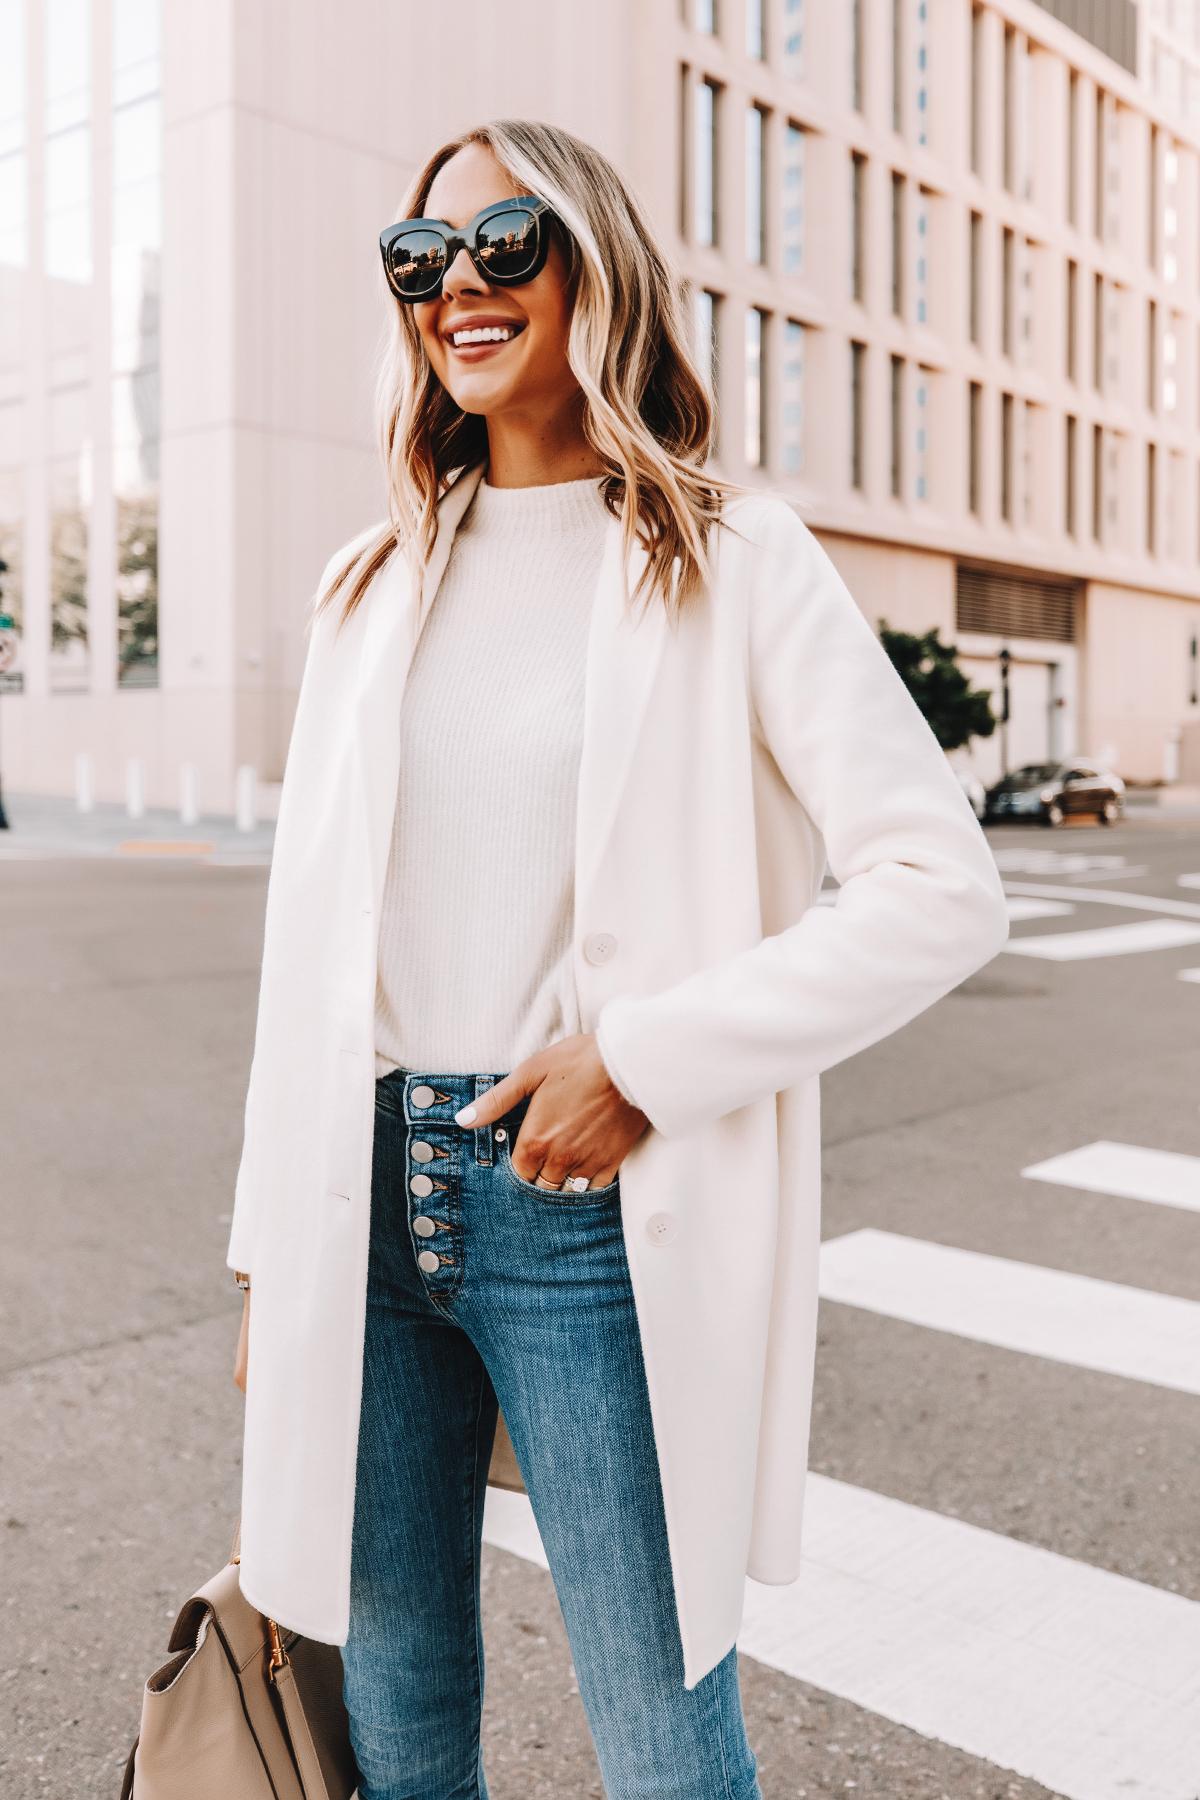 Fashion Jackson Wearing Banana Republic White Topcoat White Sweater Skinny Jeans 1